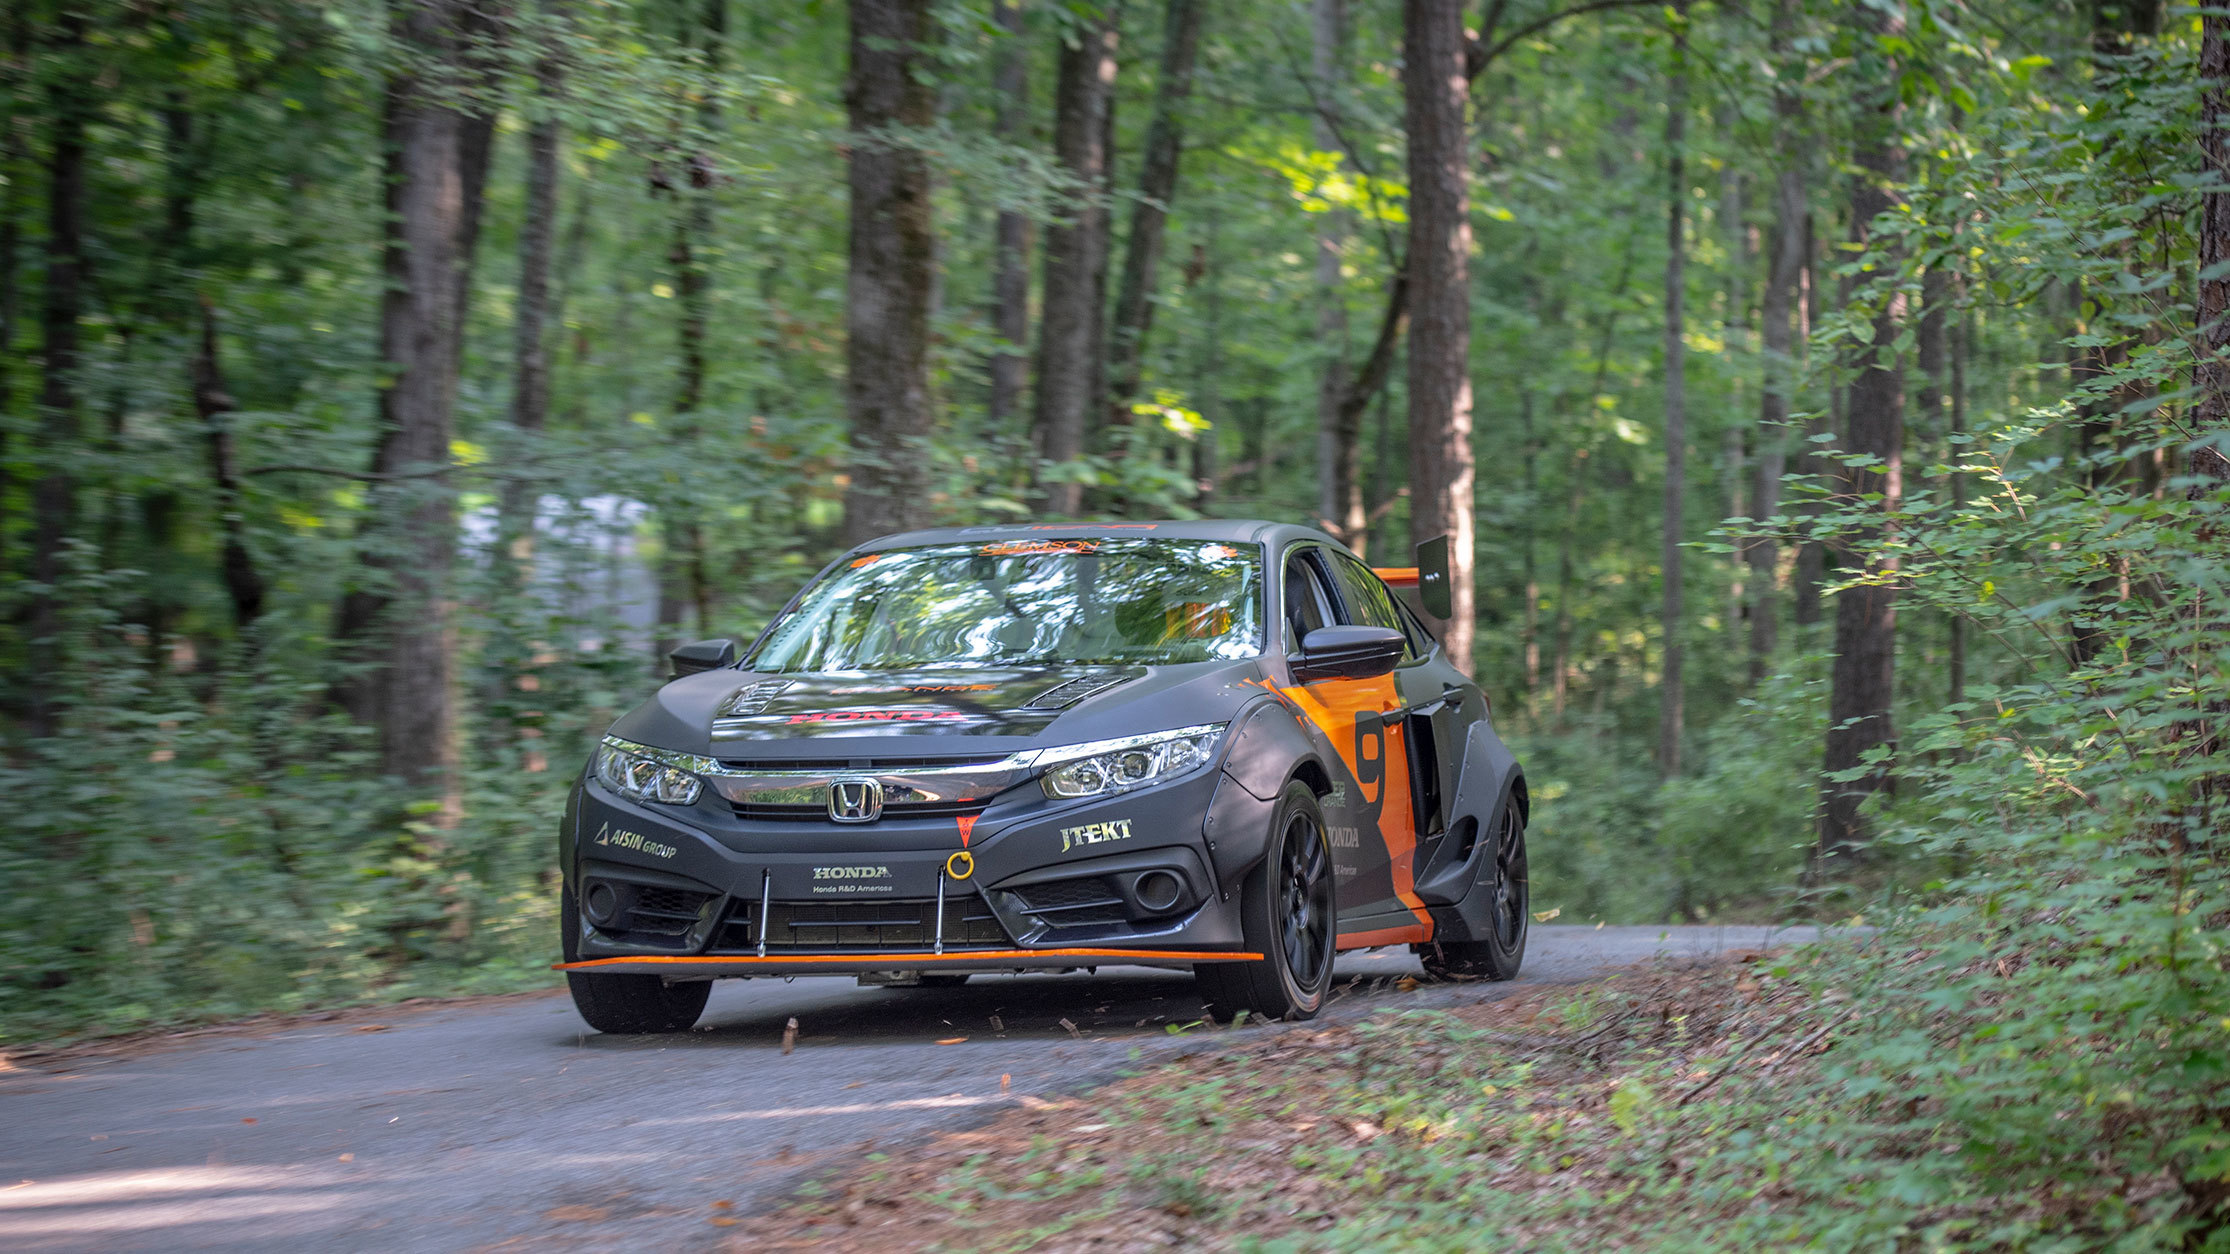 Honda Civic with hybrid powertrain byClemson University (6)